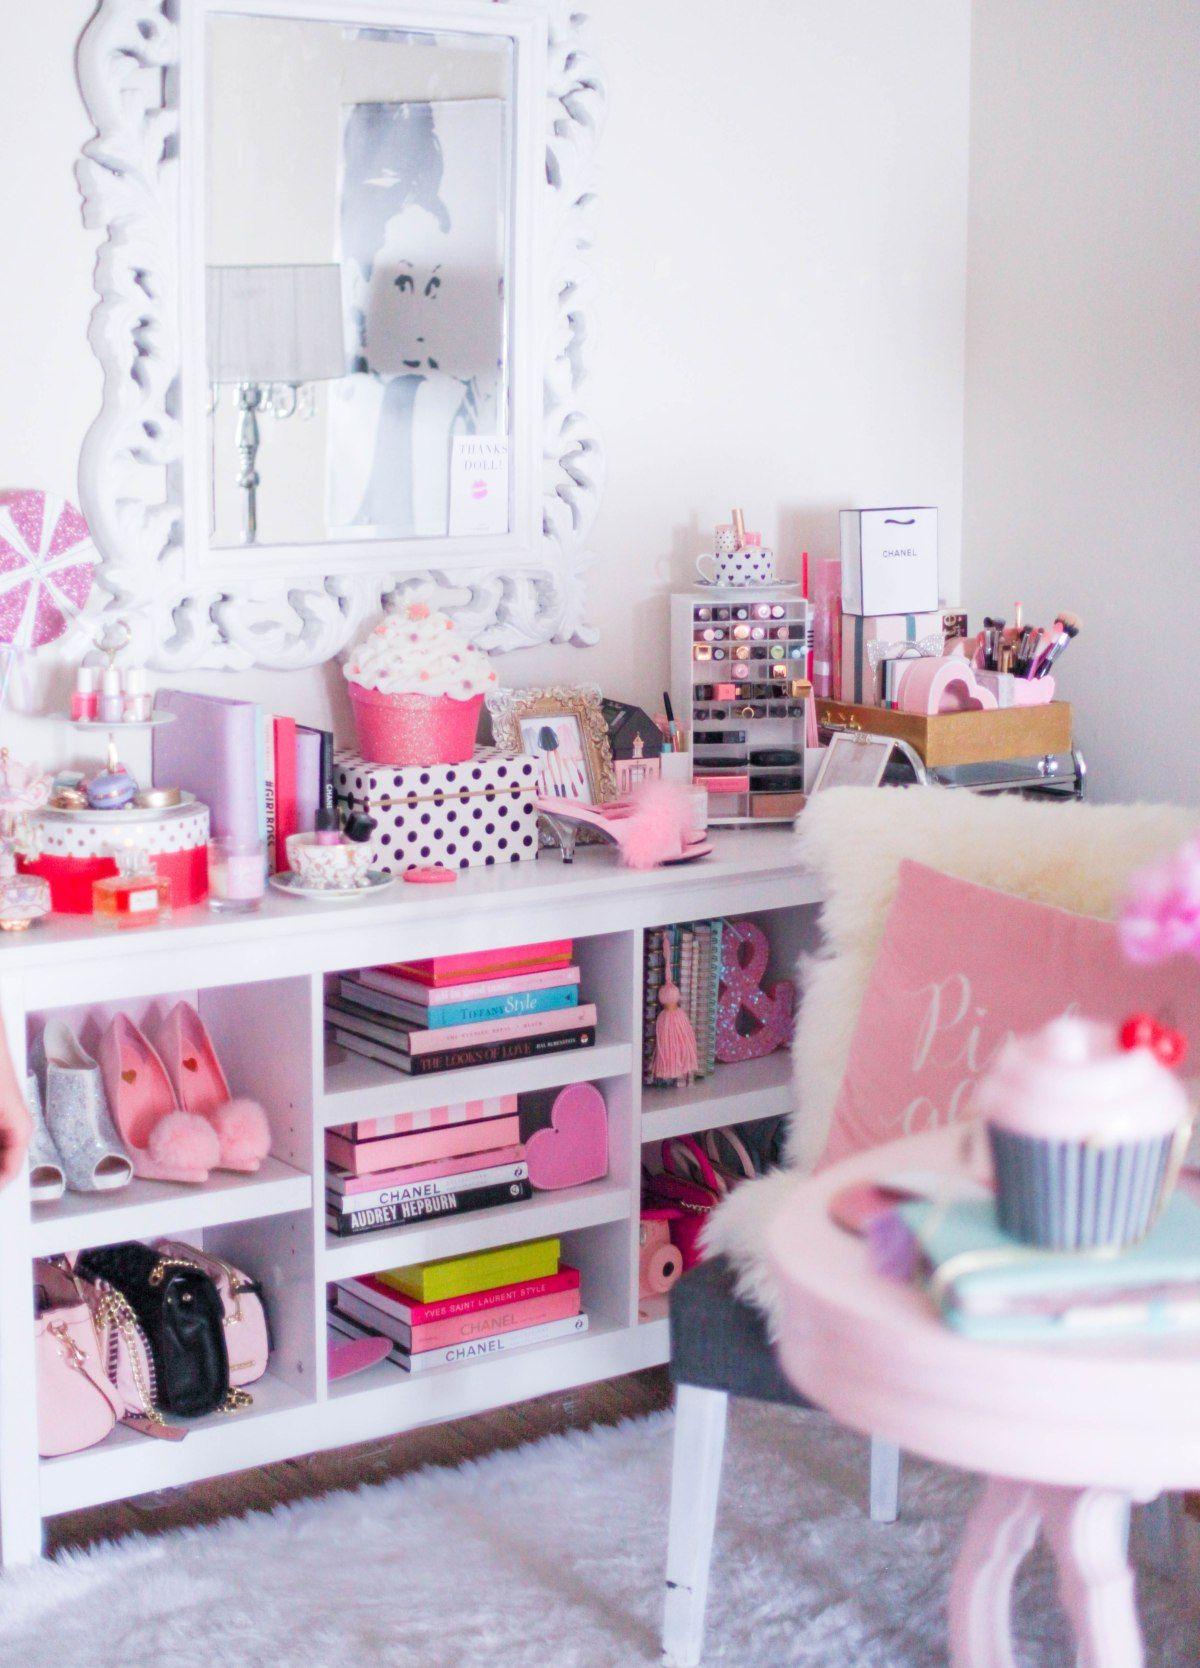 How To Make Your Workspace Pretty & Girly | Pinterest | Schönes ...